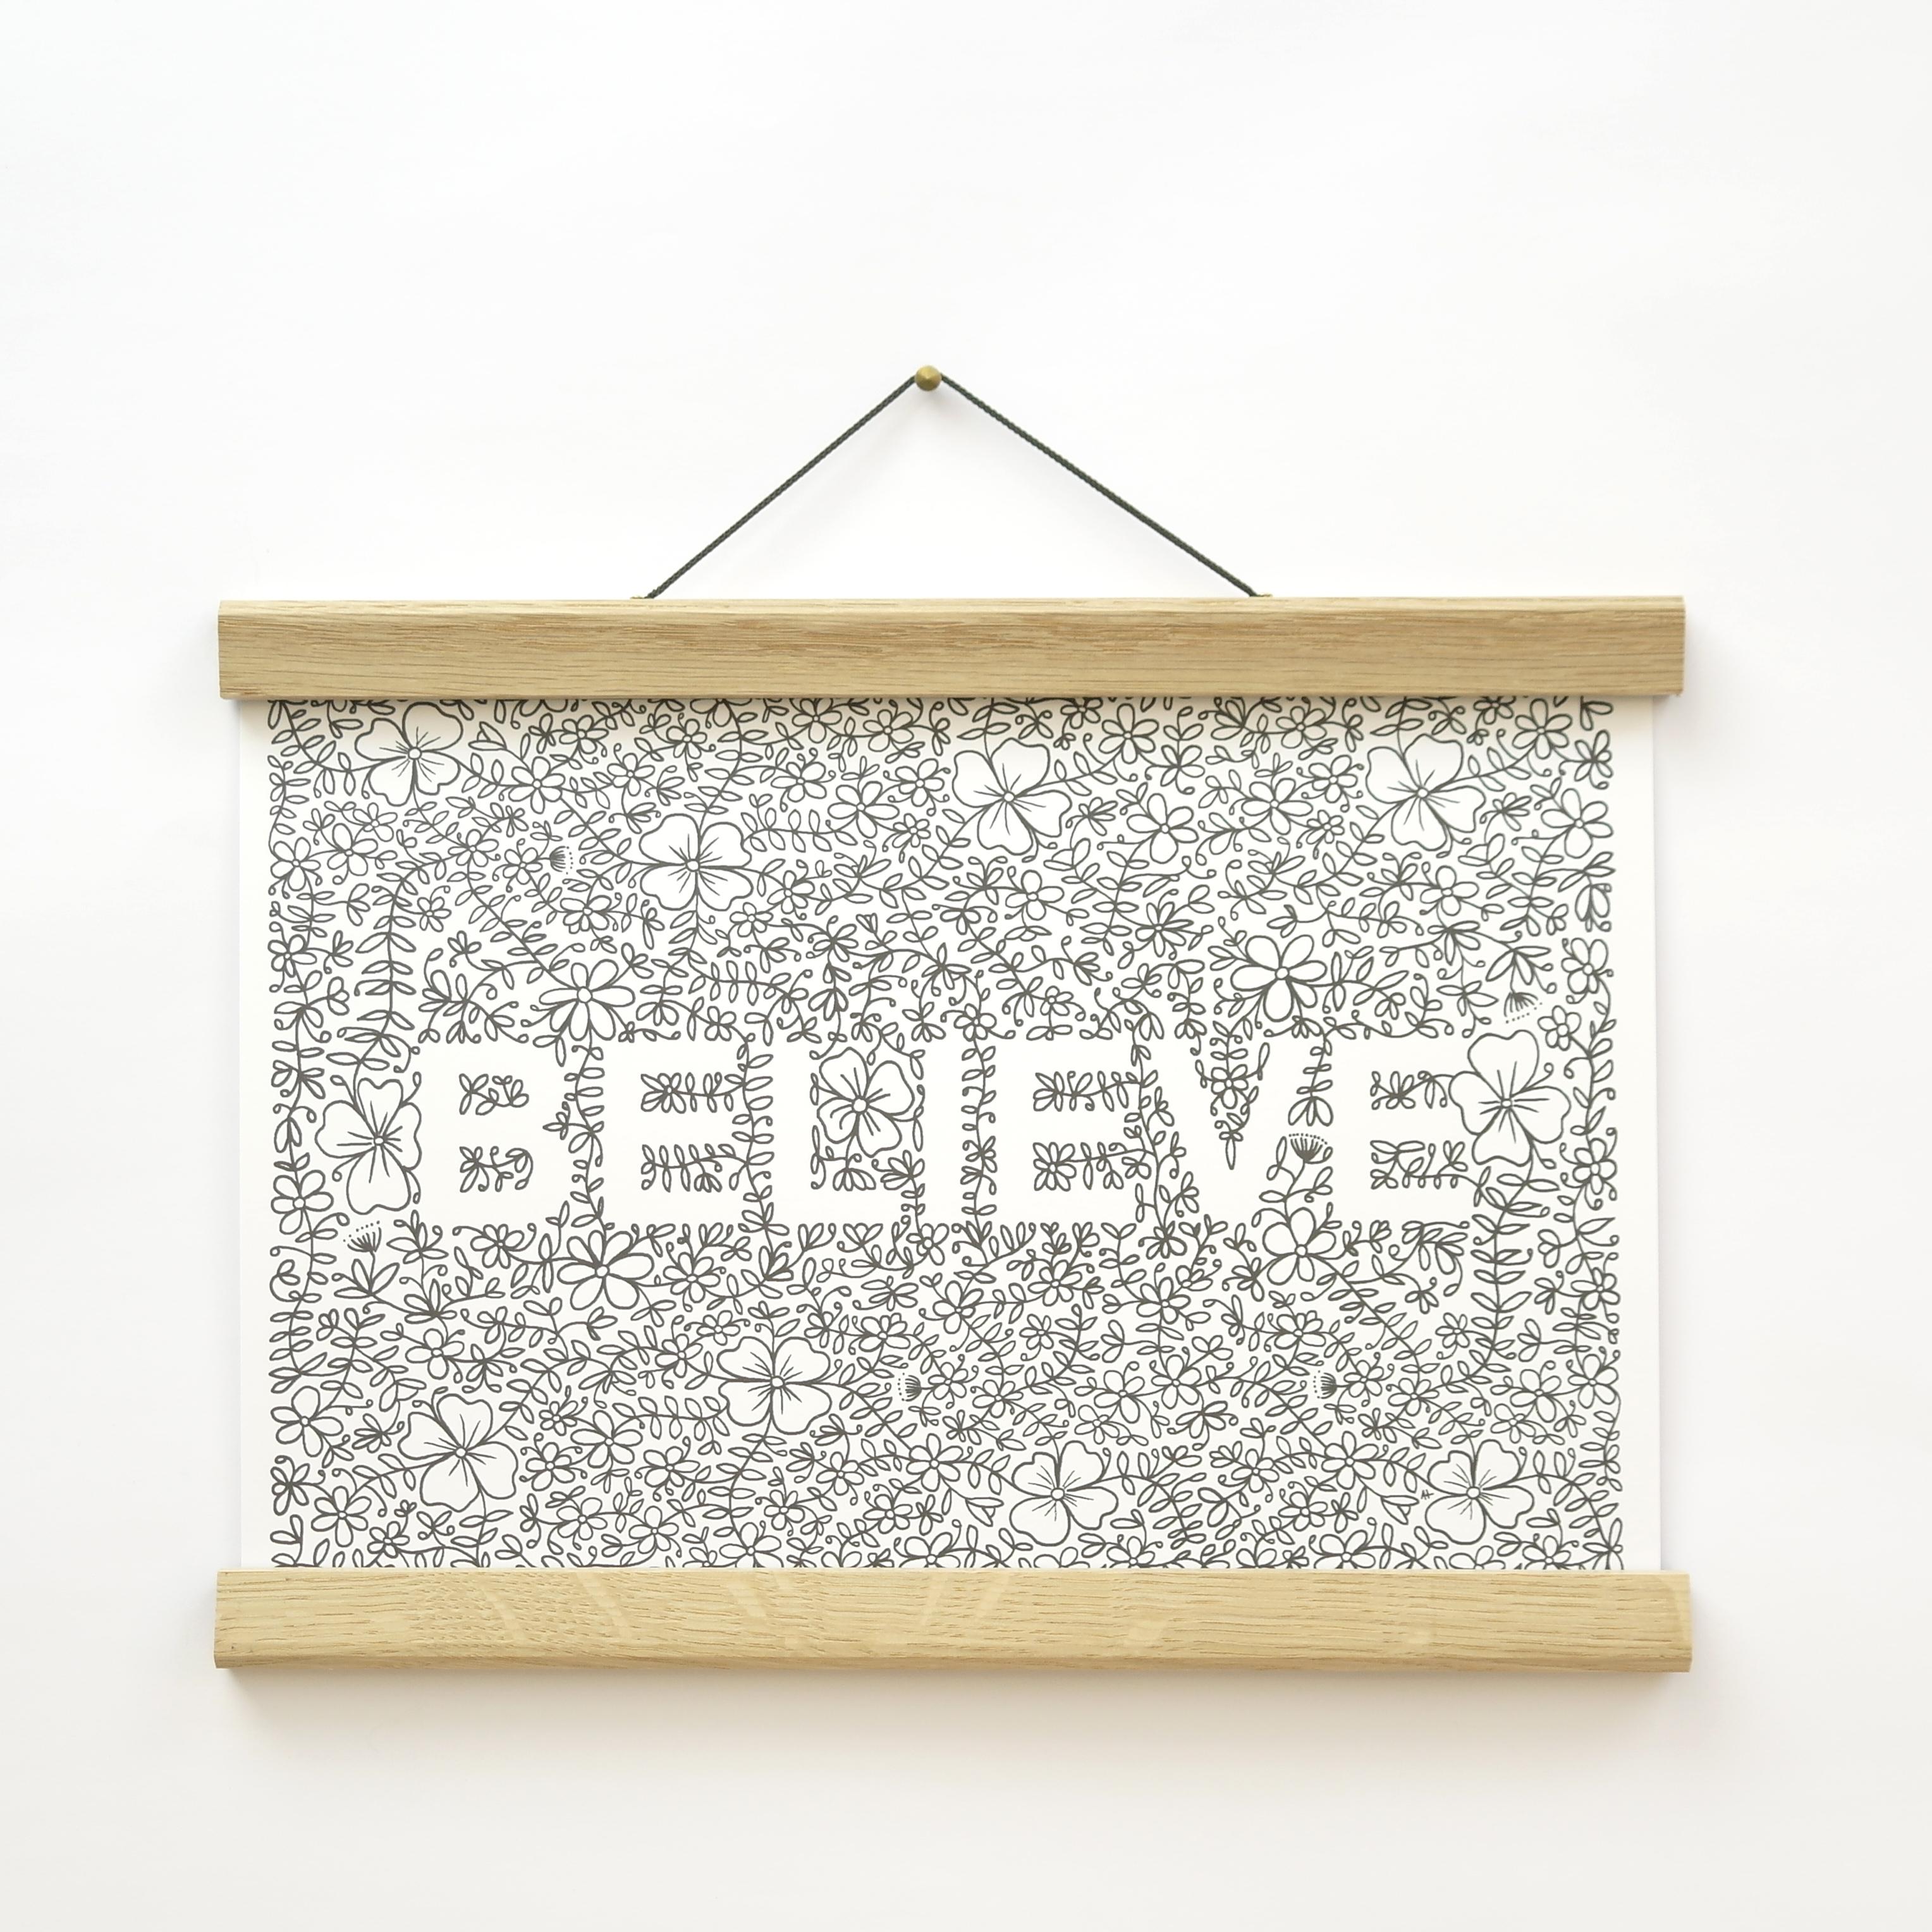 'Believe' A4 Floral Print (unframed)